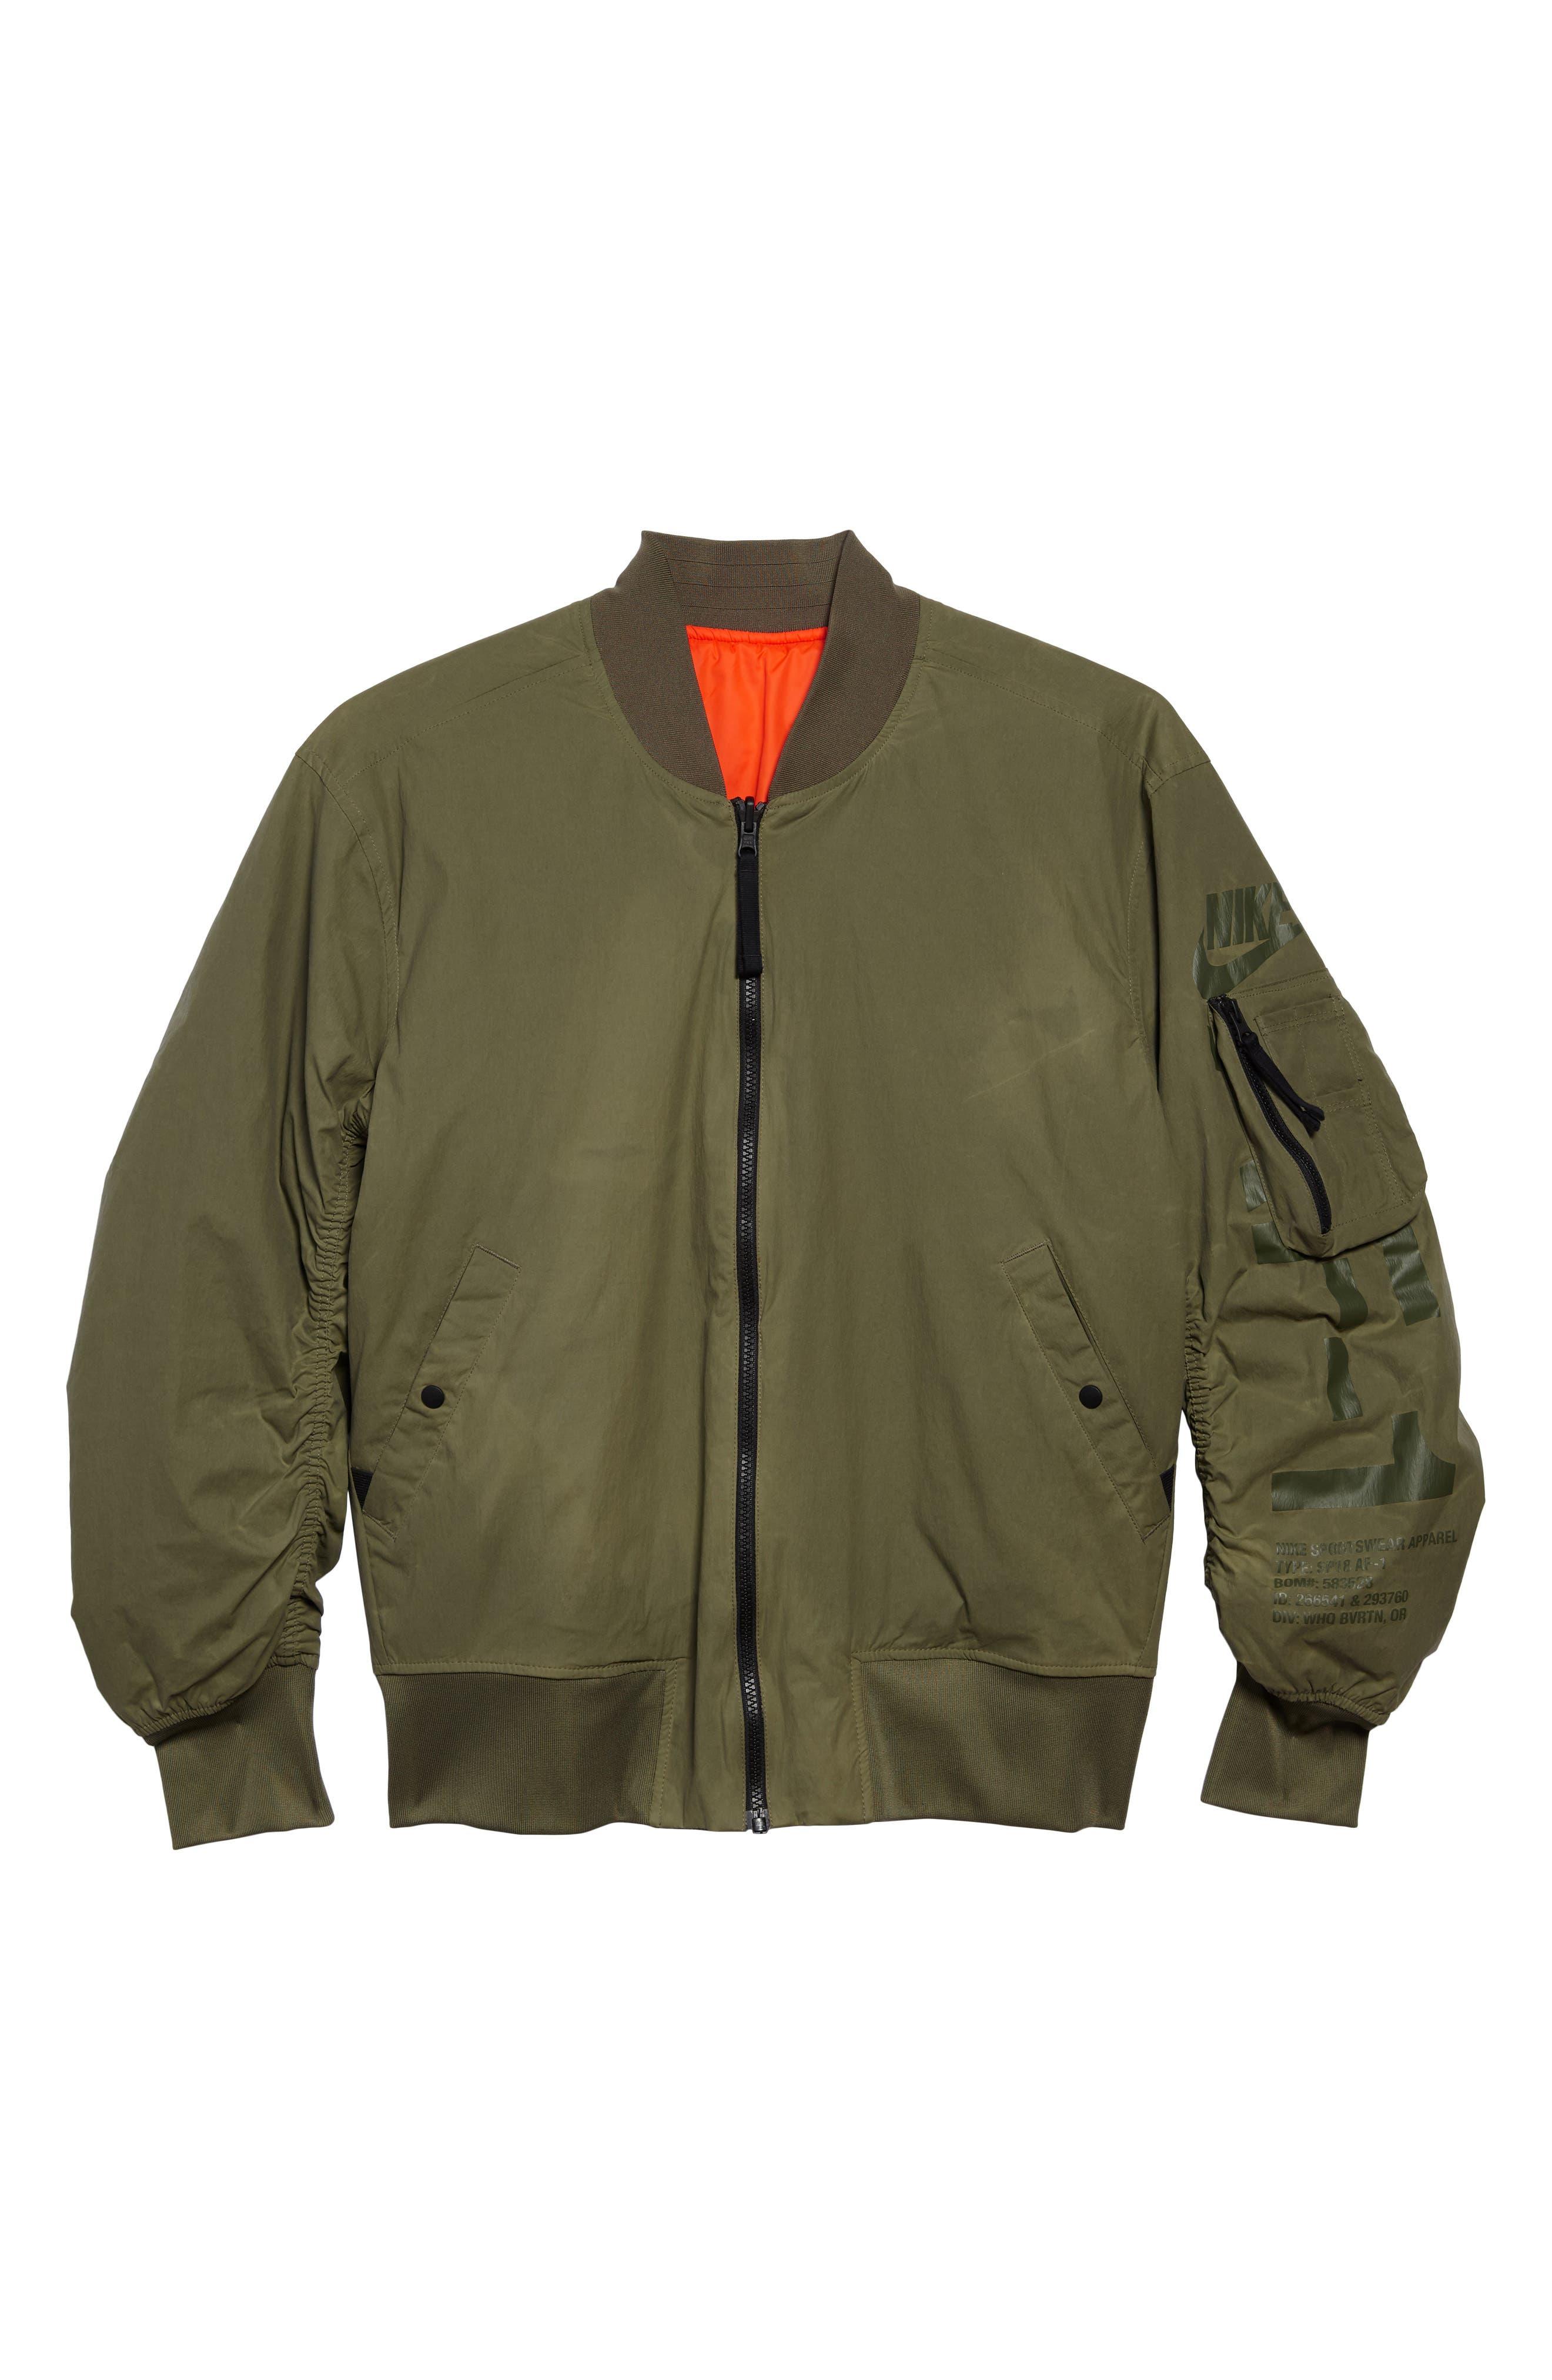 NSW Air Force 1 Jacket,                             Alternate thumbnail 7, color,                             Medium Olive/ Orange/ Olive